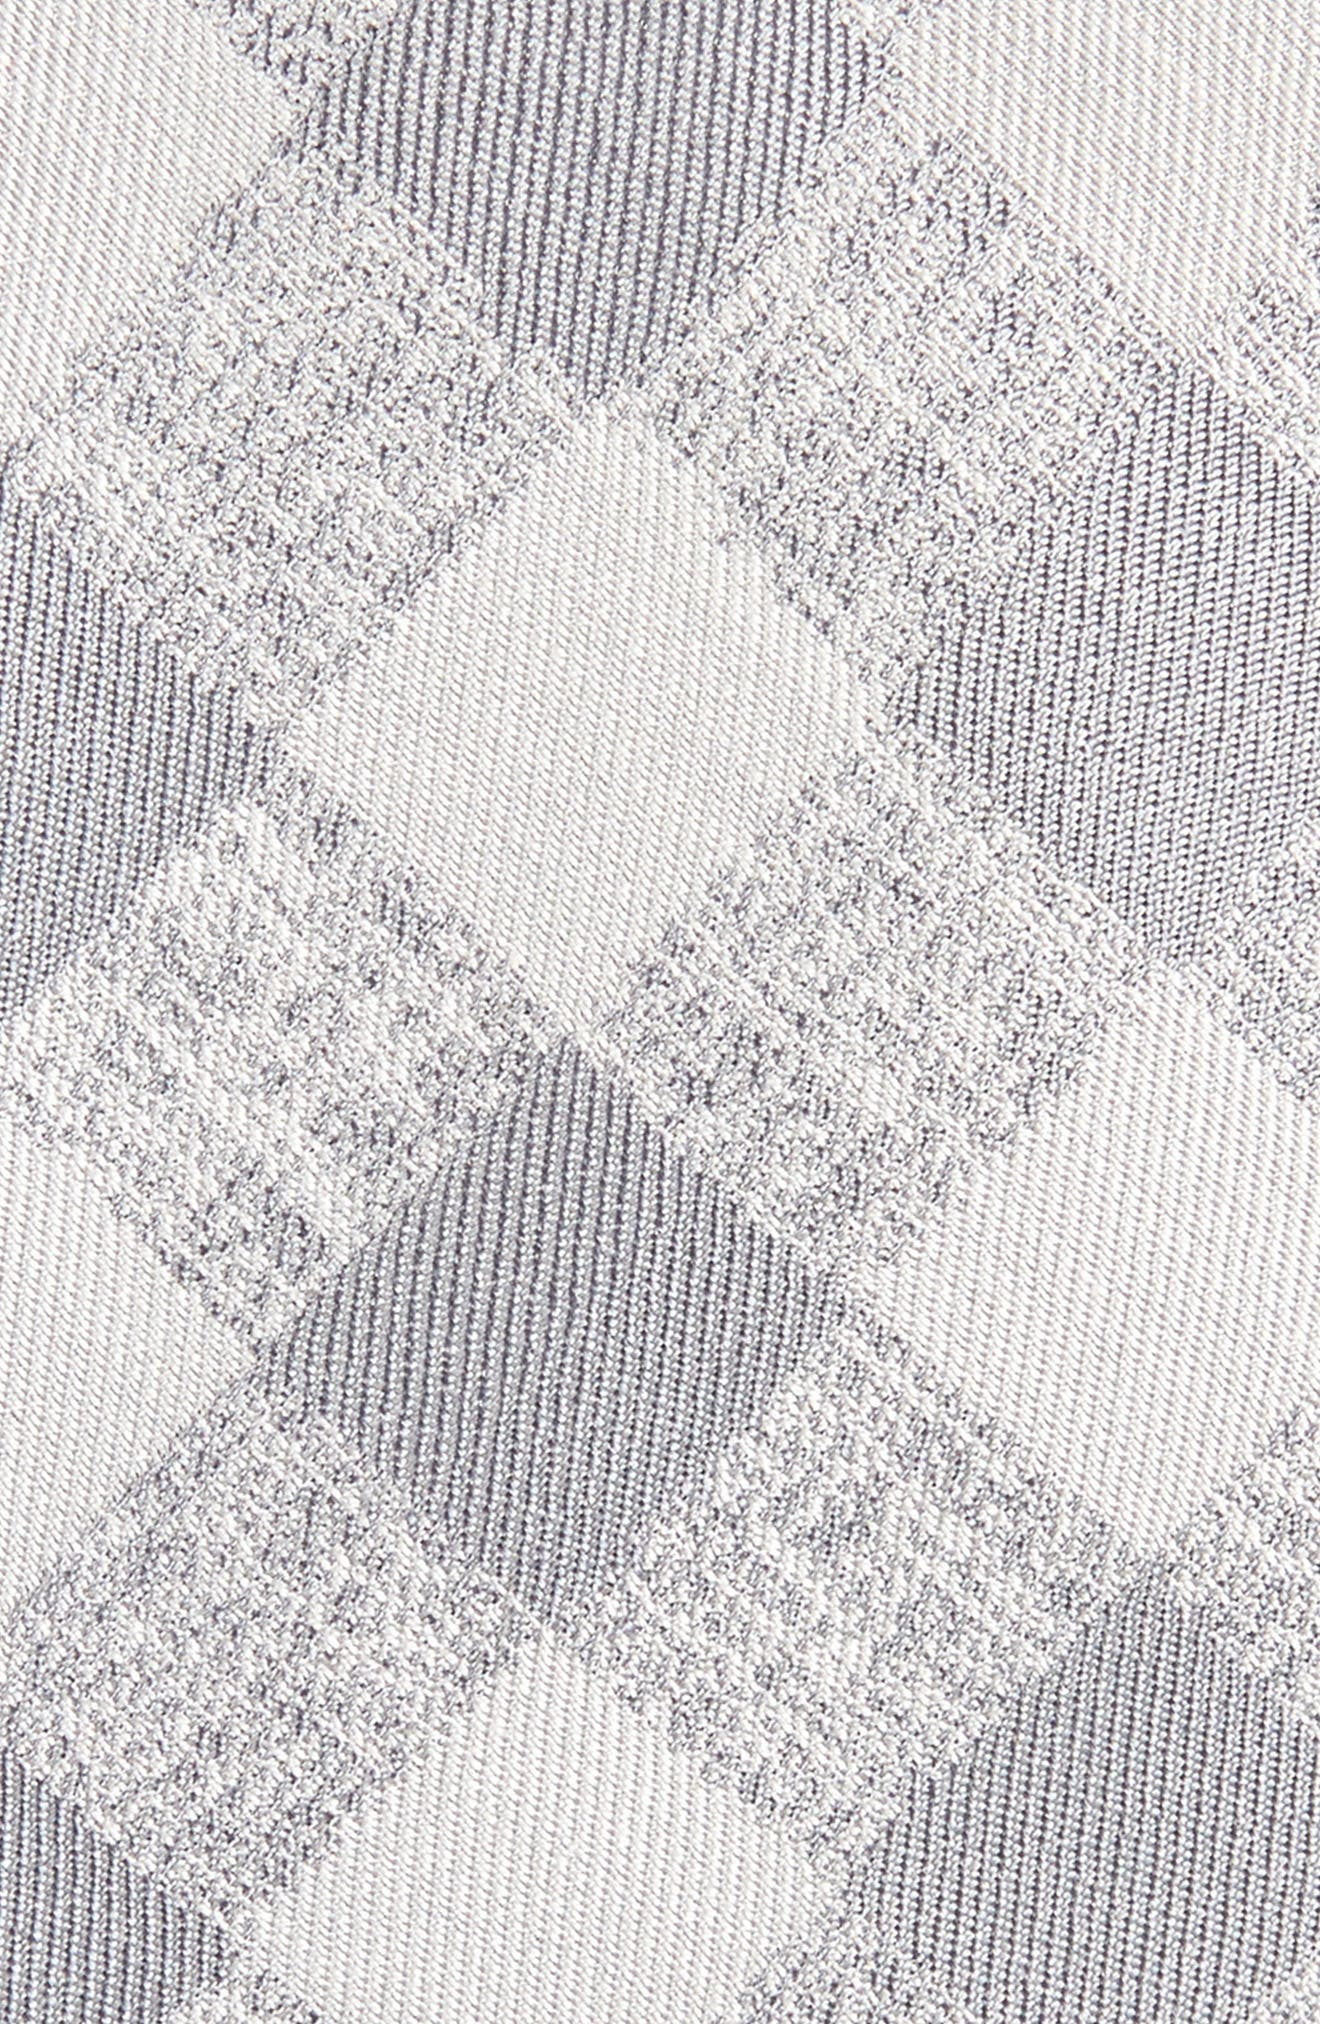 Tigrane Check Silk & Cotton Tie,                             Alternate thumbnail 2, color,                             Grey